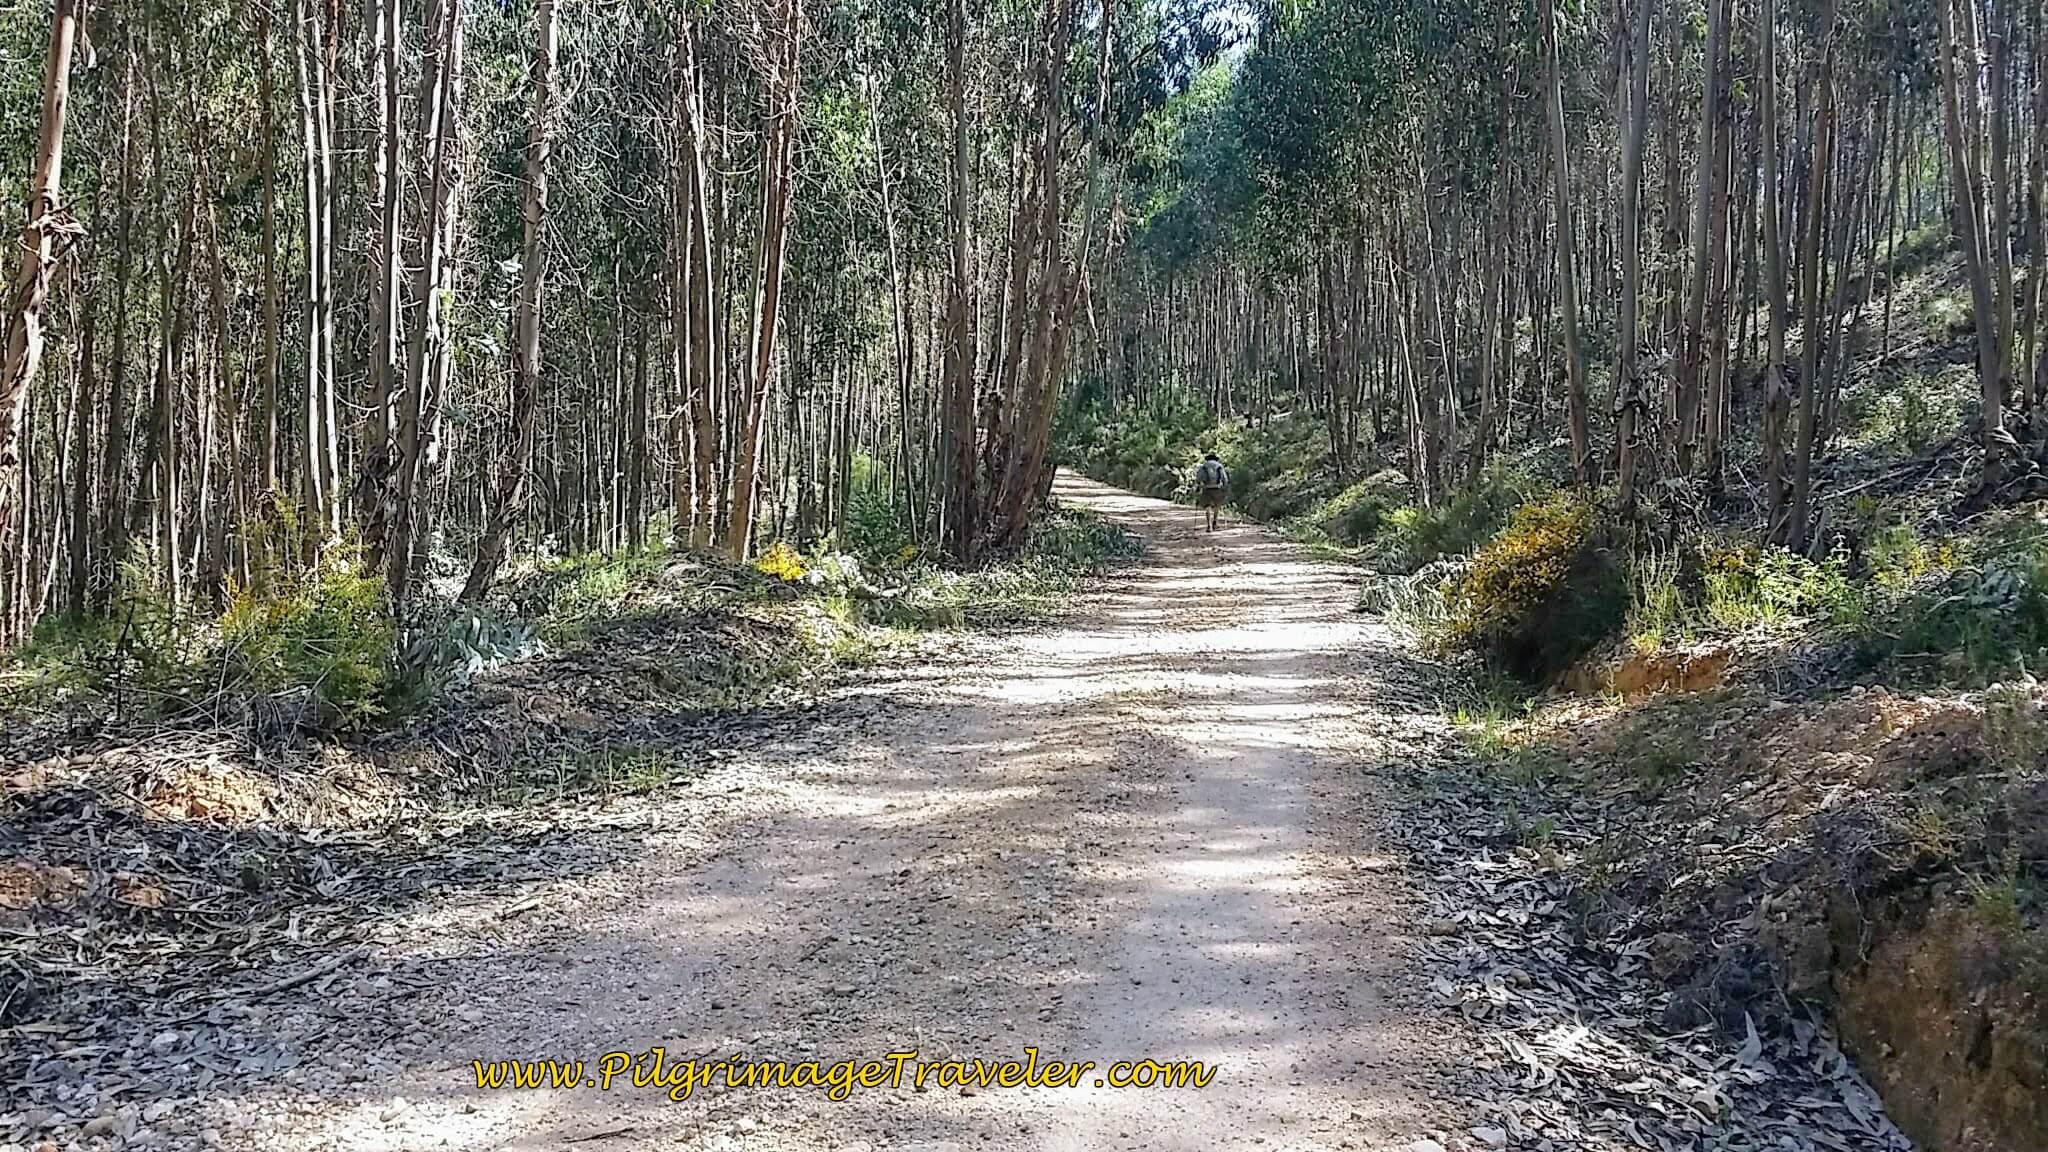 Climbing Toward Grou in the Eucalyptus Forest on the Portuguese Camino